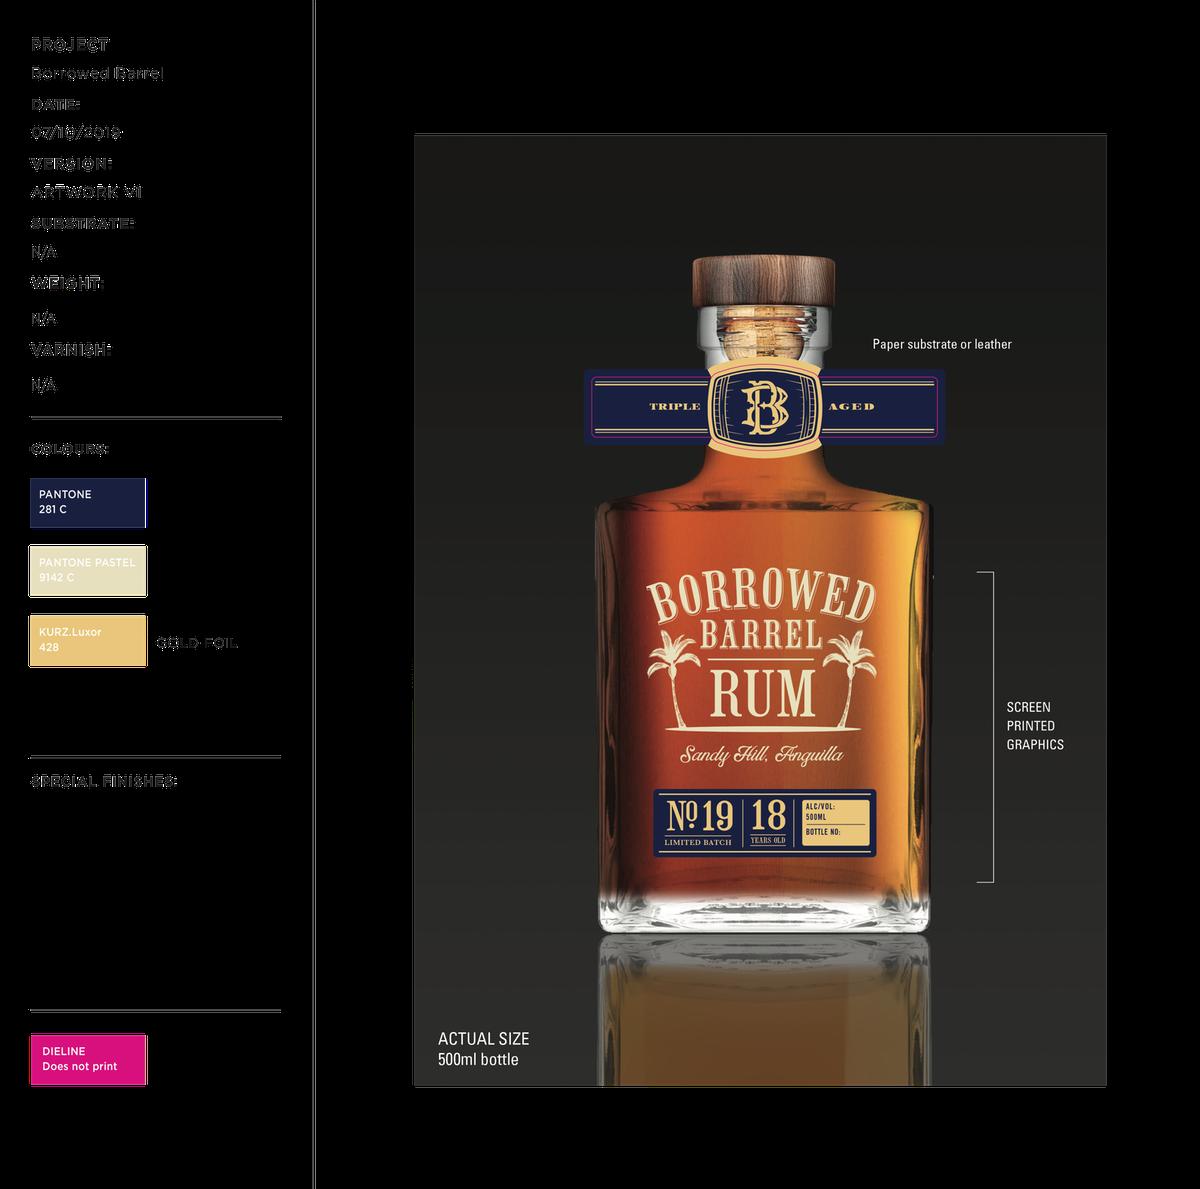 Label for Borrowed Barrel